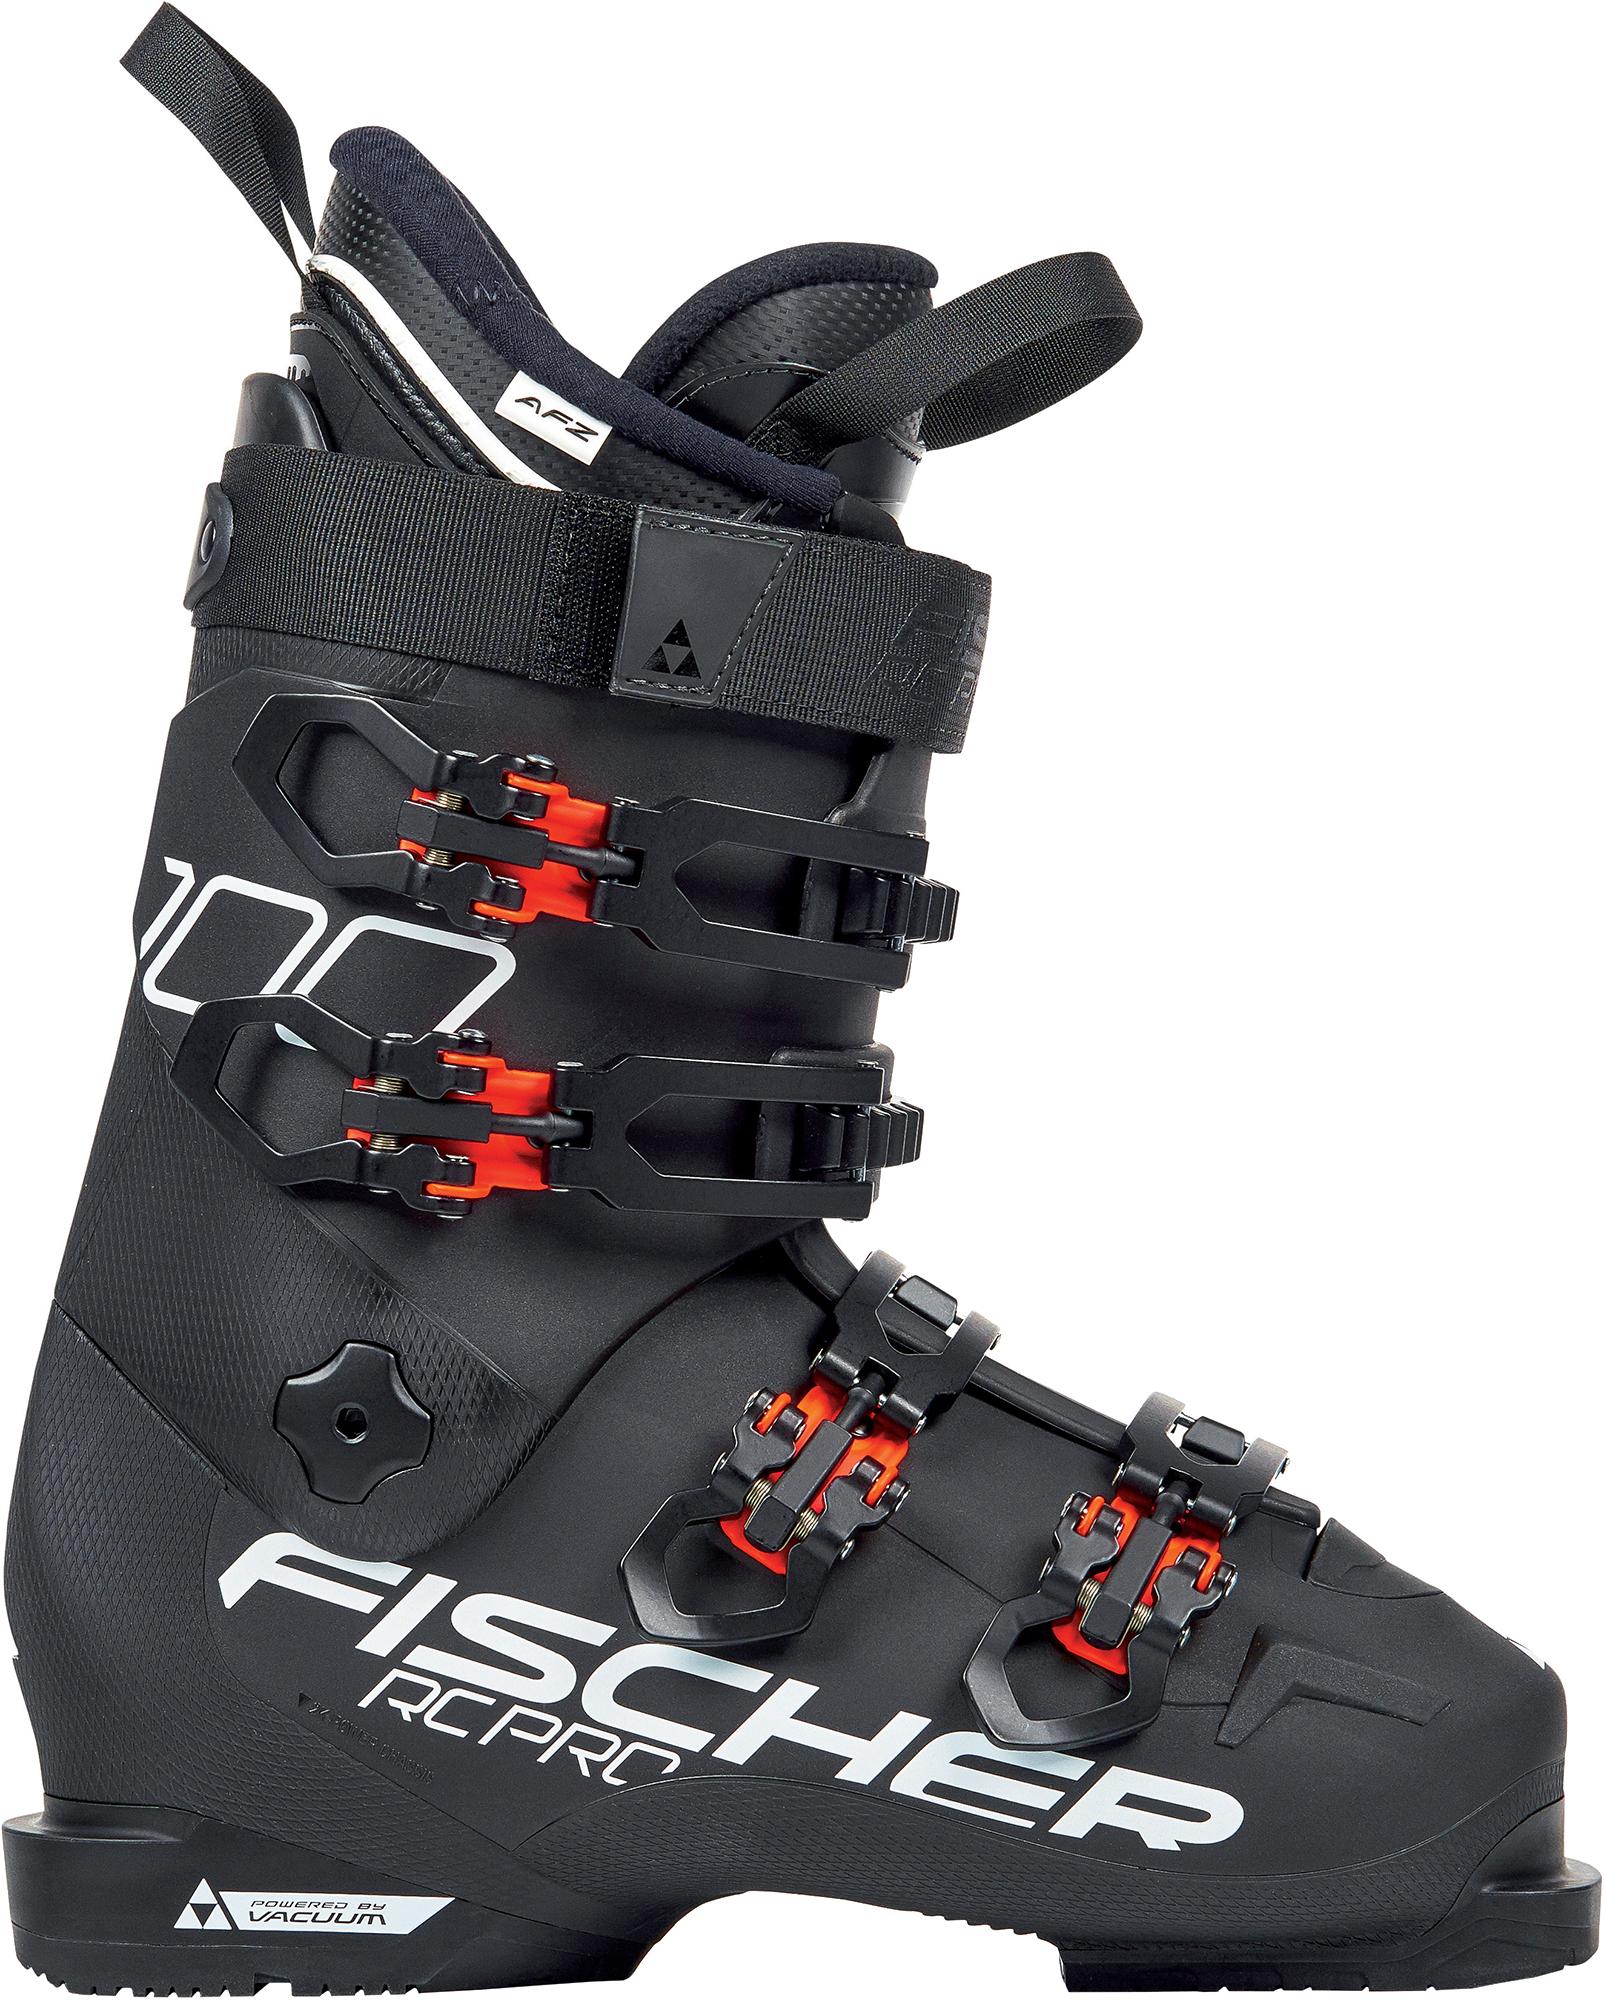 Fischer Ботинки горнолыжные Rc Pro 100 Pbv, размер 45